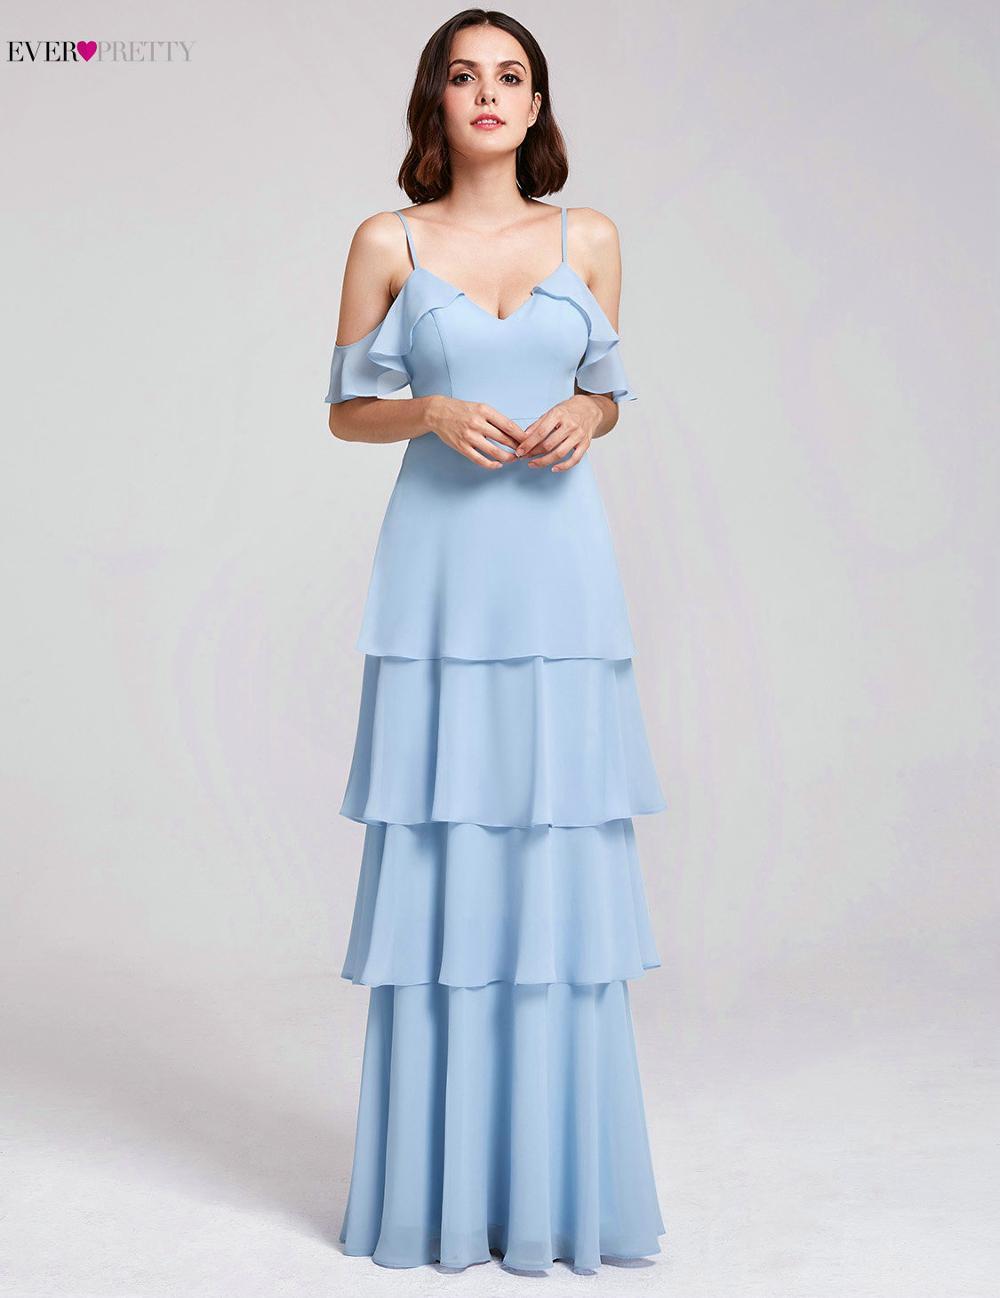 40b67c00c6 US $34.99 40% OFF|Burgundy Bridesmaid Dresses Ever Pretty Off Shoulder  Ruffles Elegant Dress Women For Wedding Party Gowns Vestidos De Madrinha-in  ...